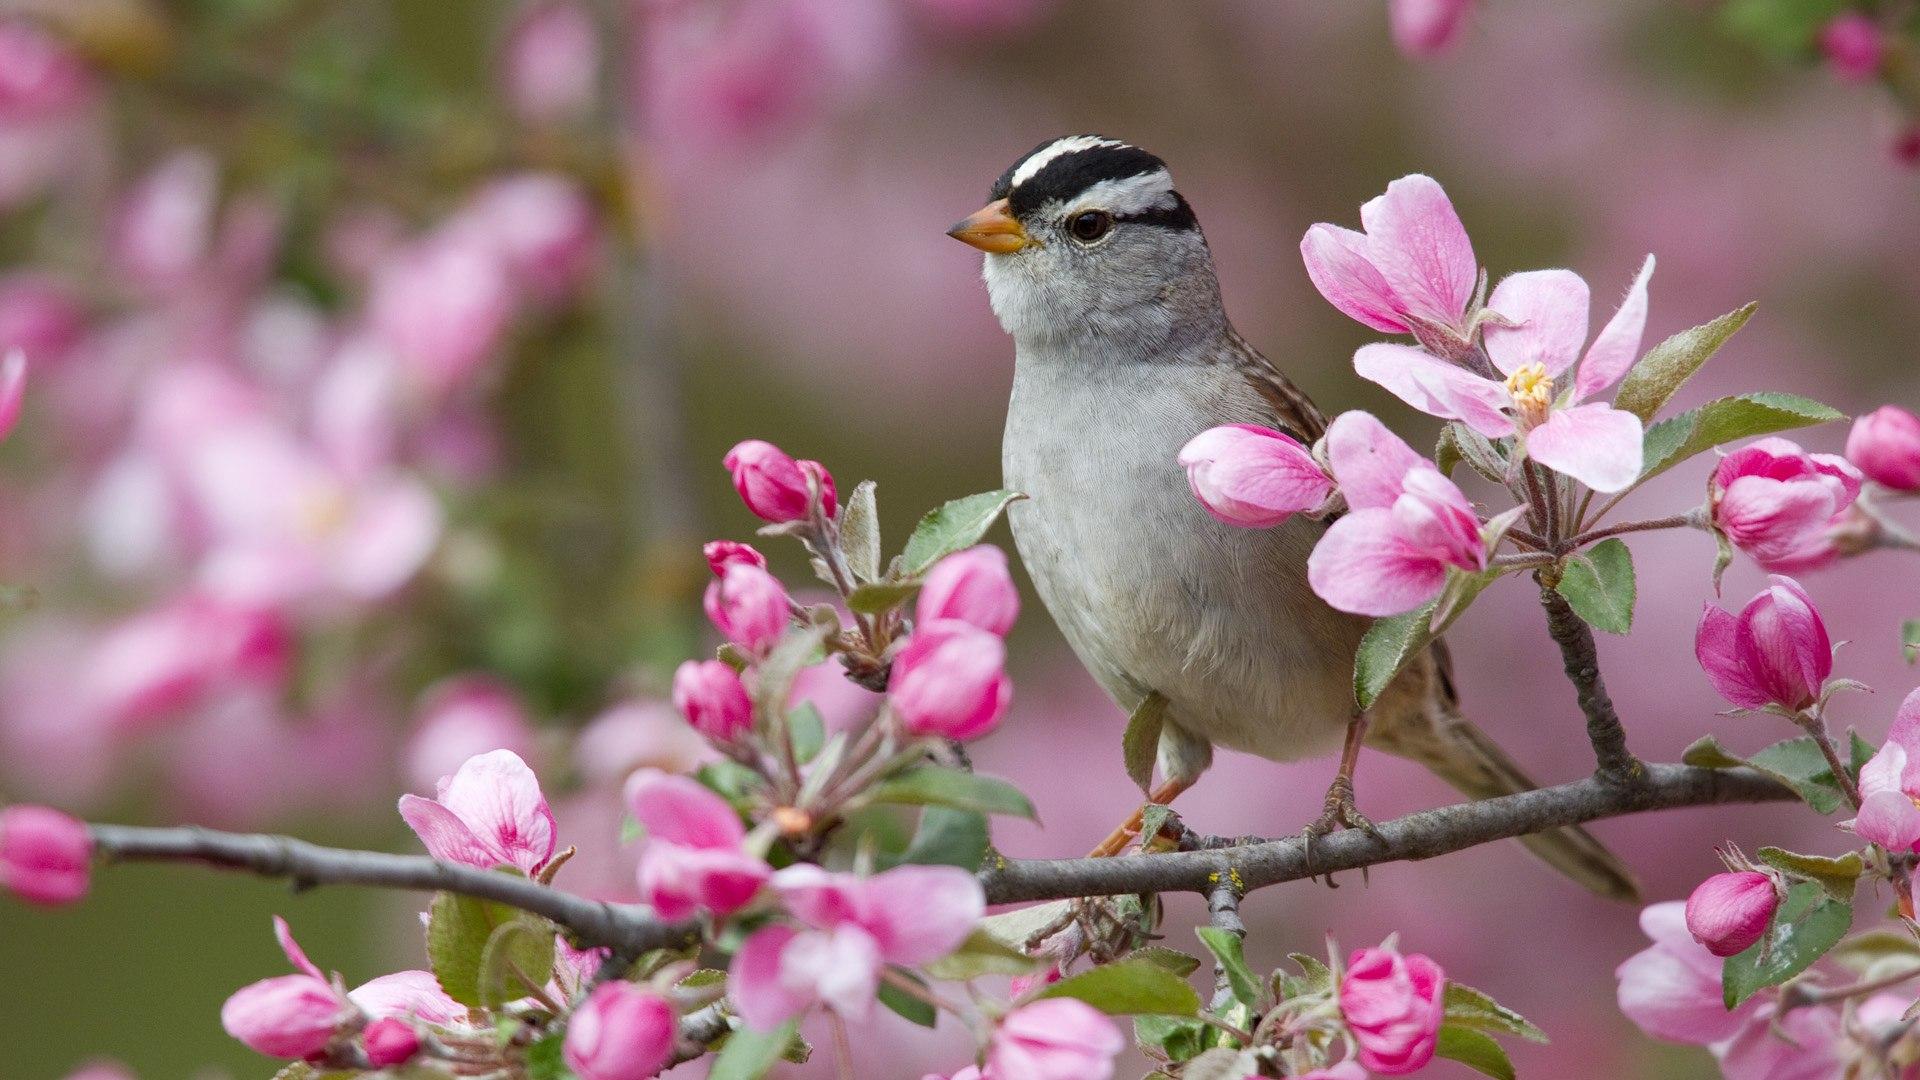 Hd wallpaper spring - Spring Animal Desktop Backgrounds Hd 7704 Hd Wallpapers Site